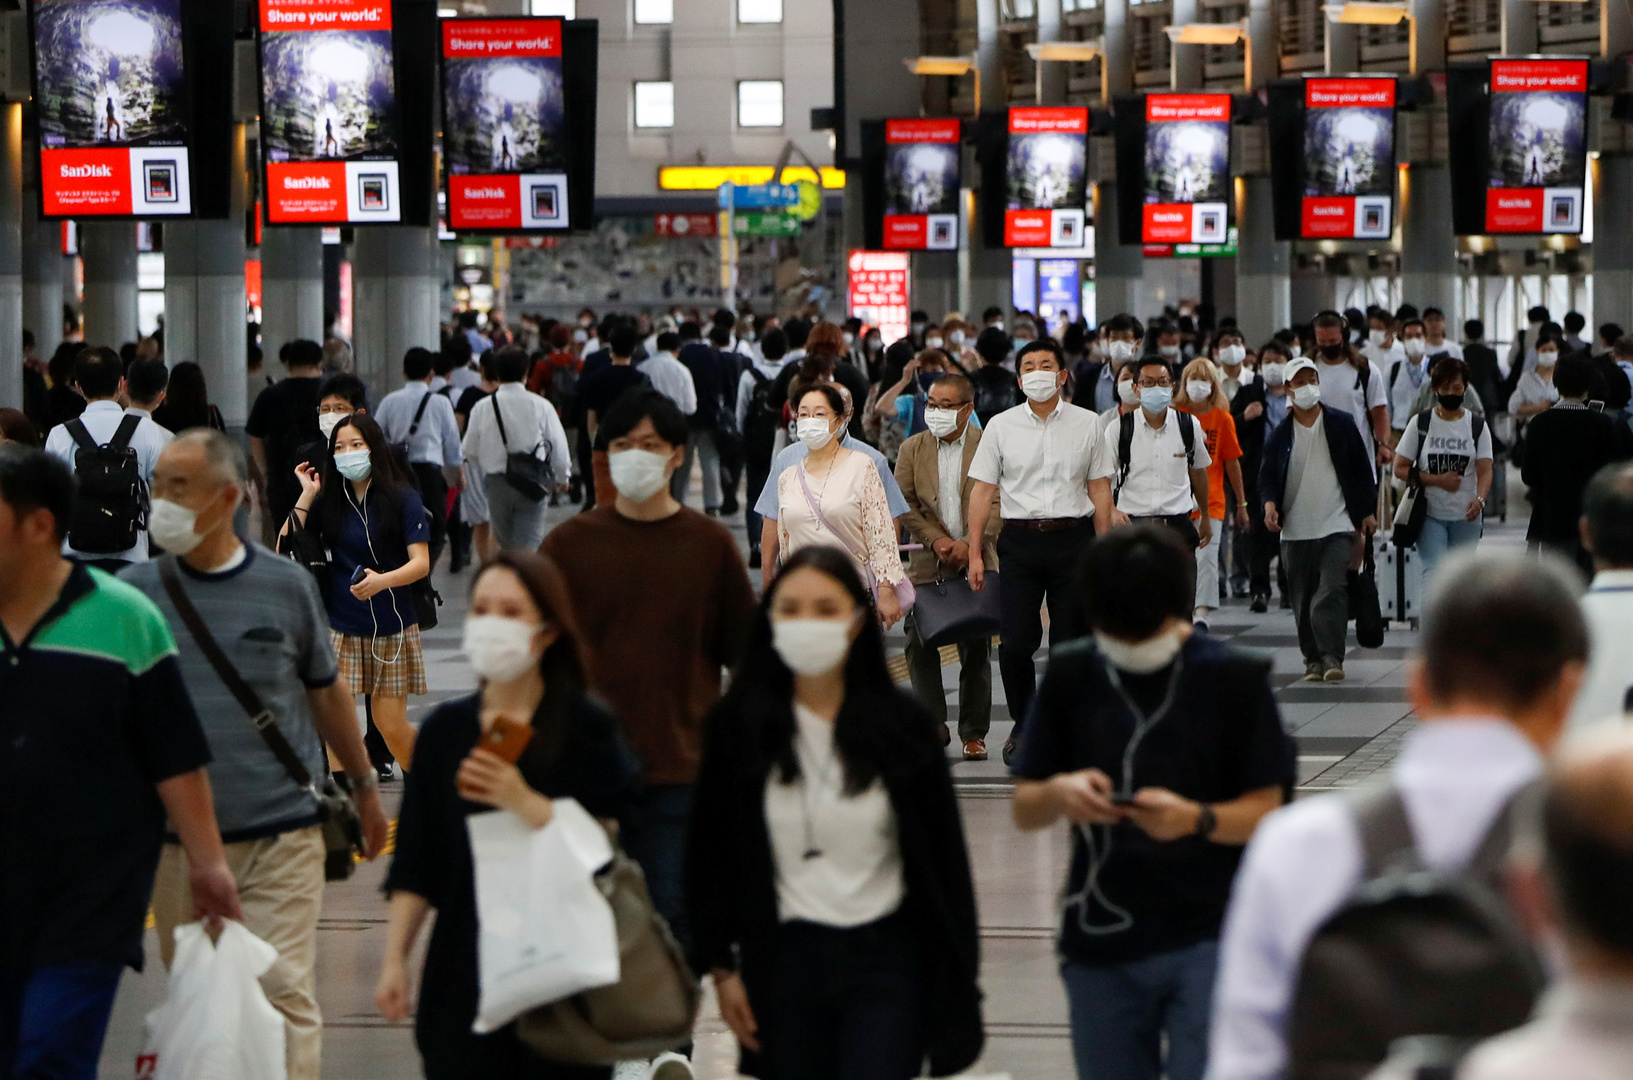 تفشي فيروس كورونا في طوكيو